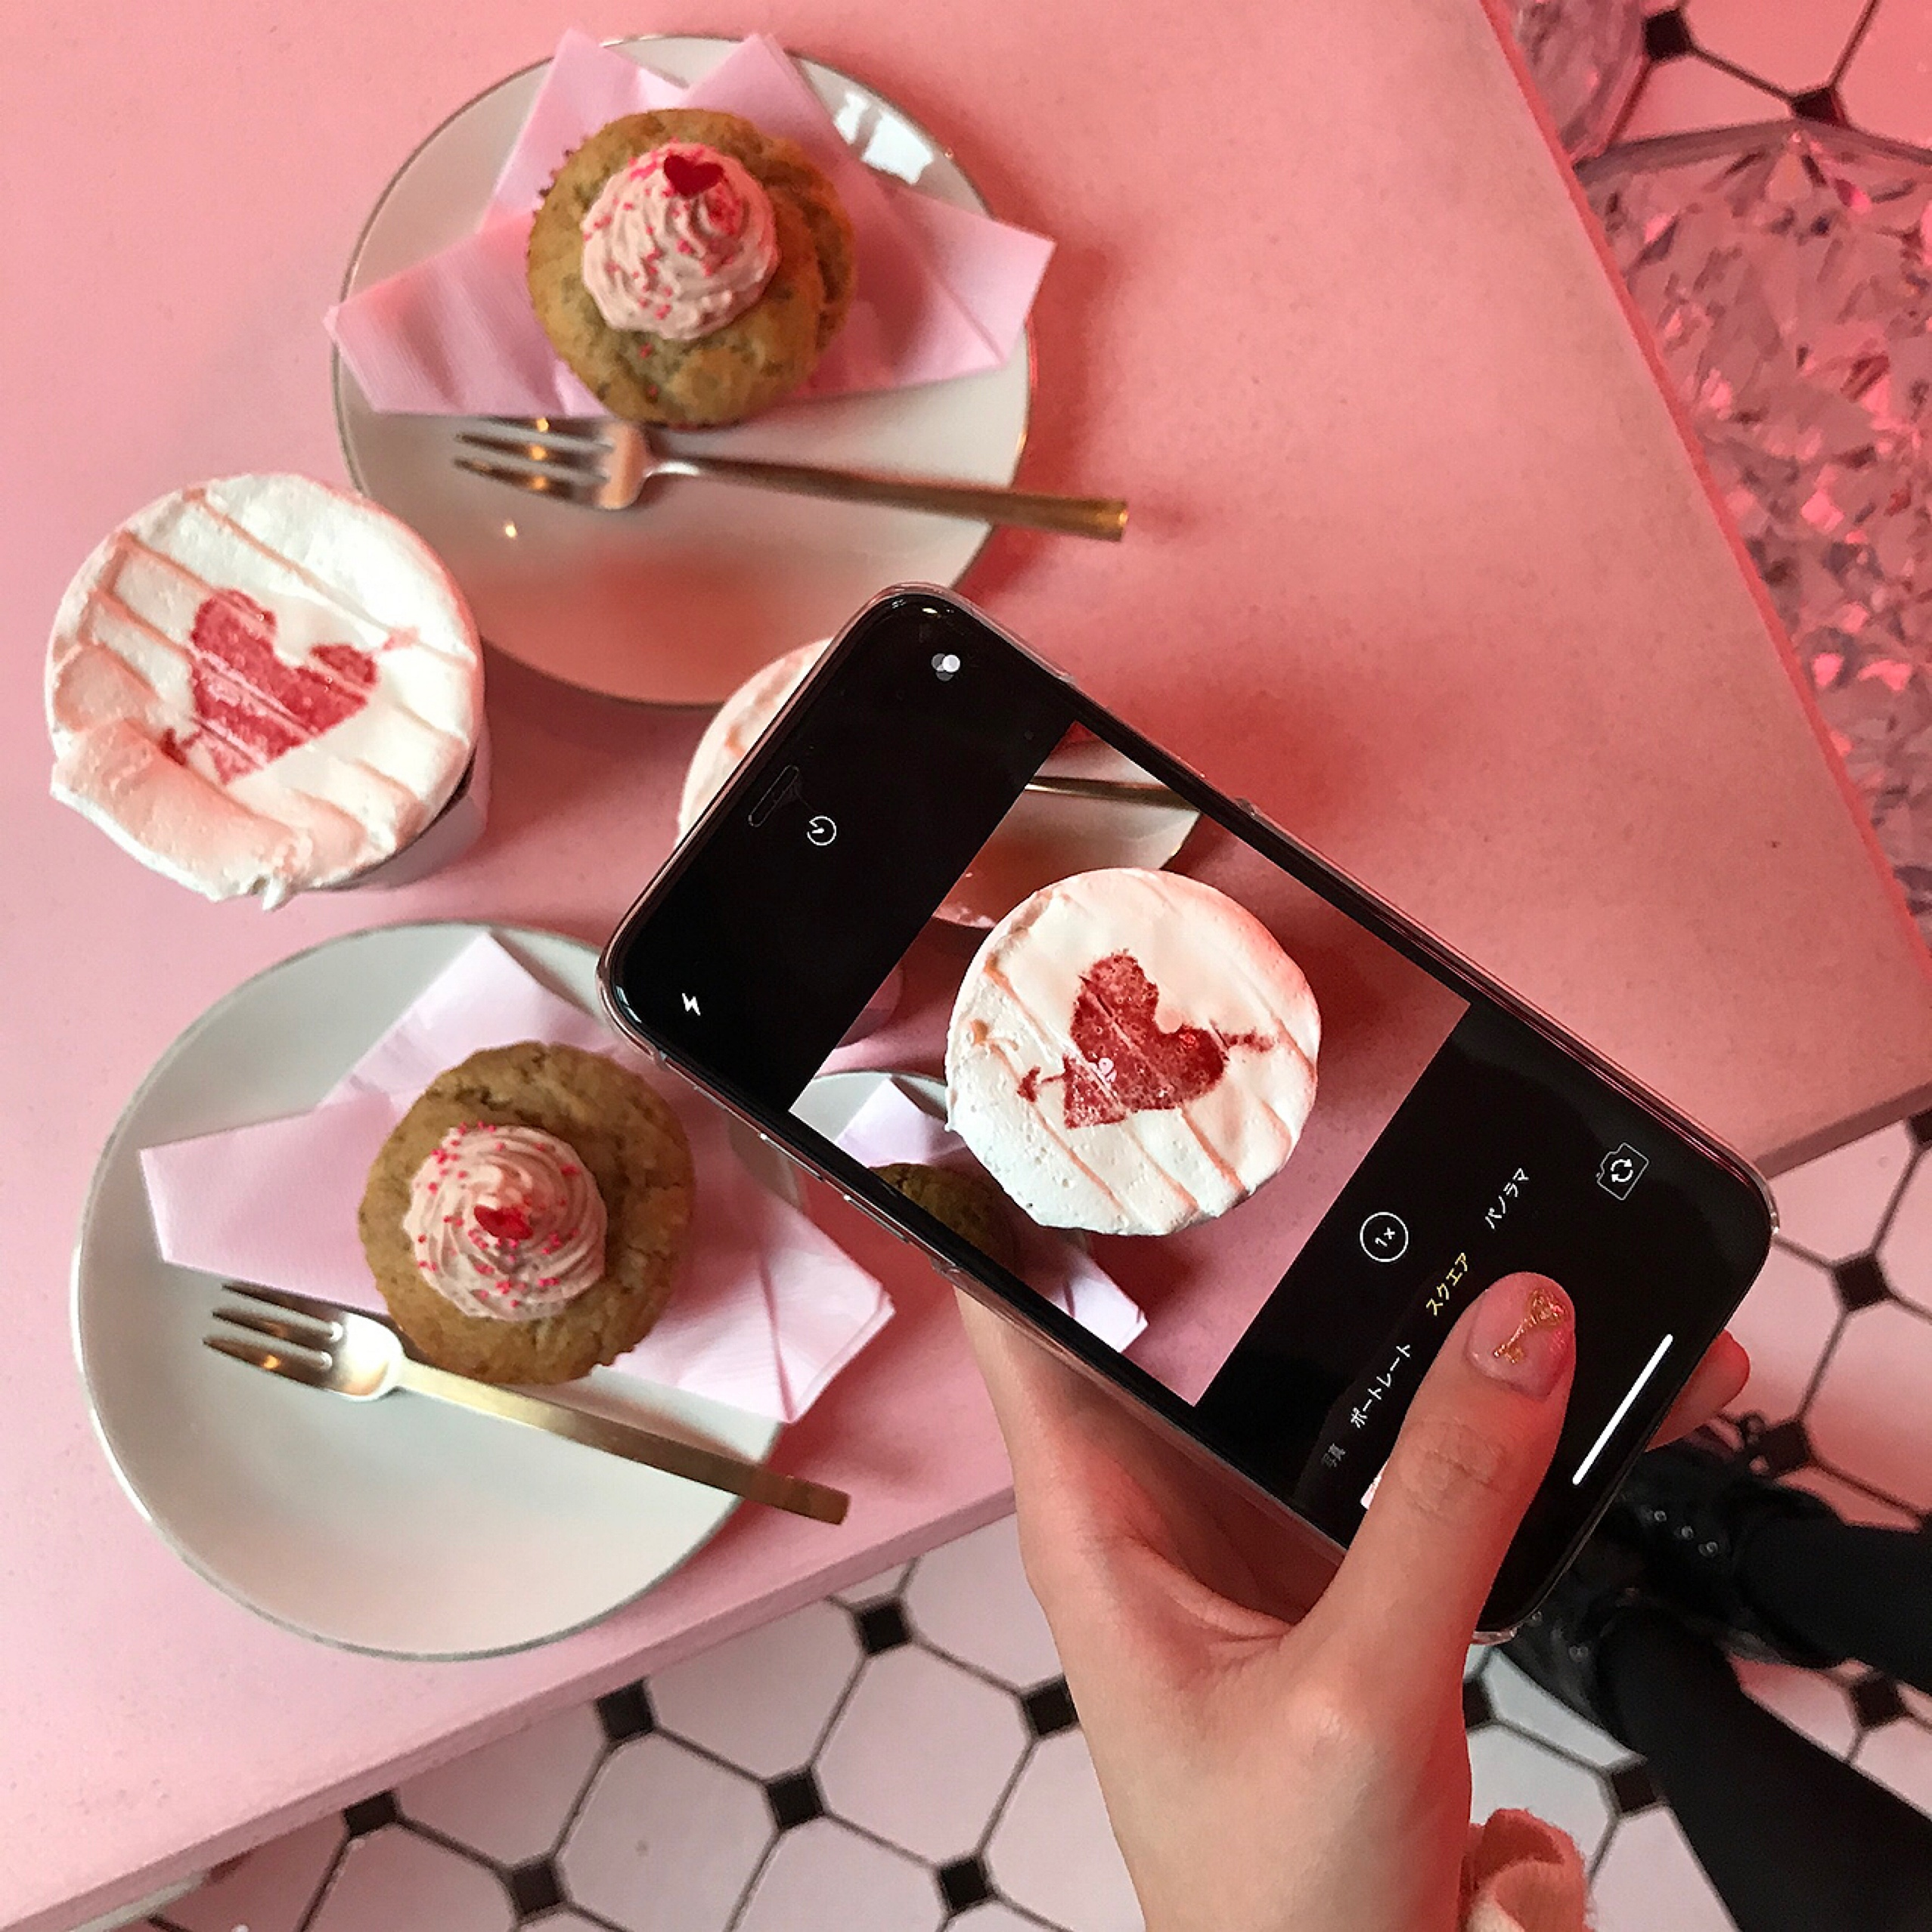 Vol.43♡ CAFE HONEY MI HONEYの《ホワイトデー限定メニュー》❤︎_1_2-2